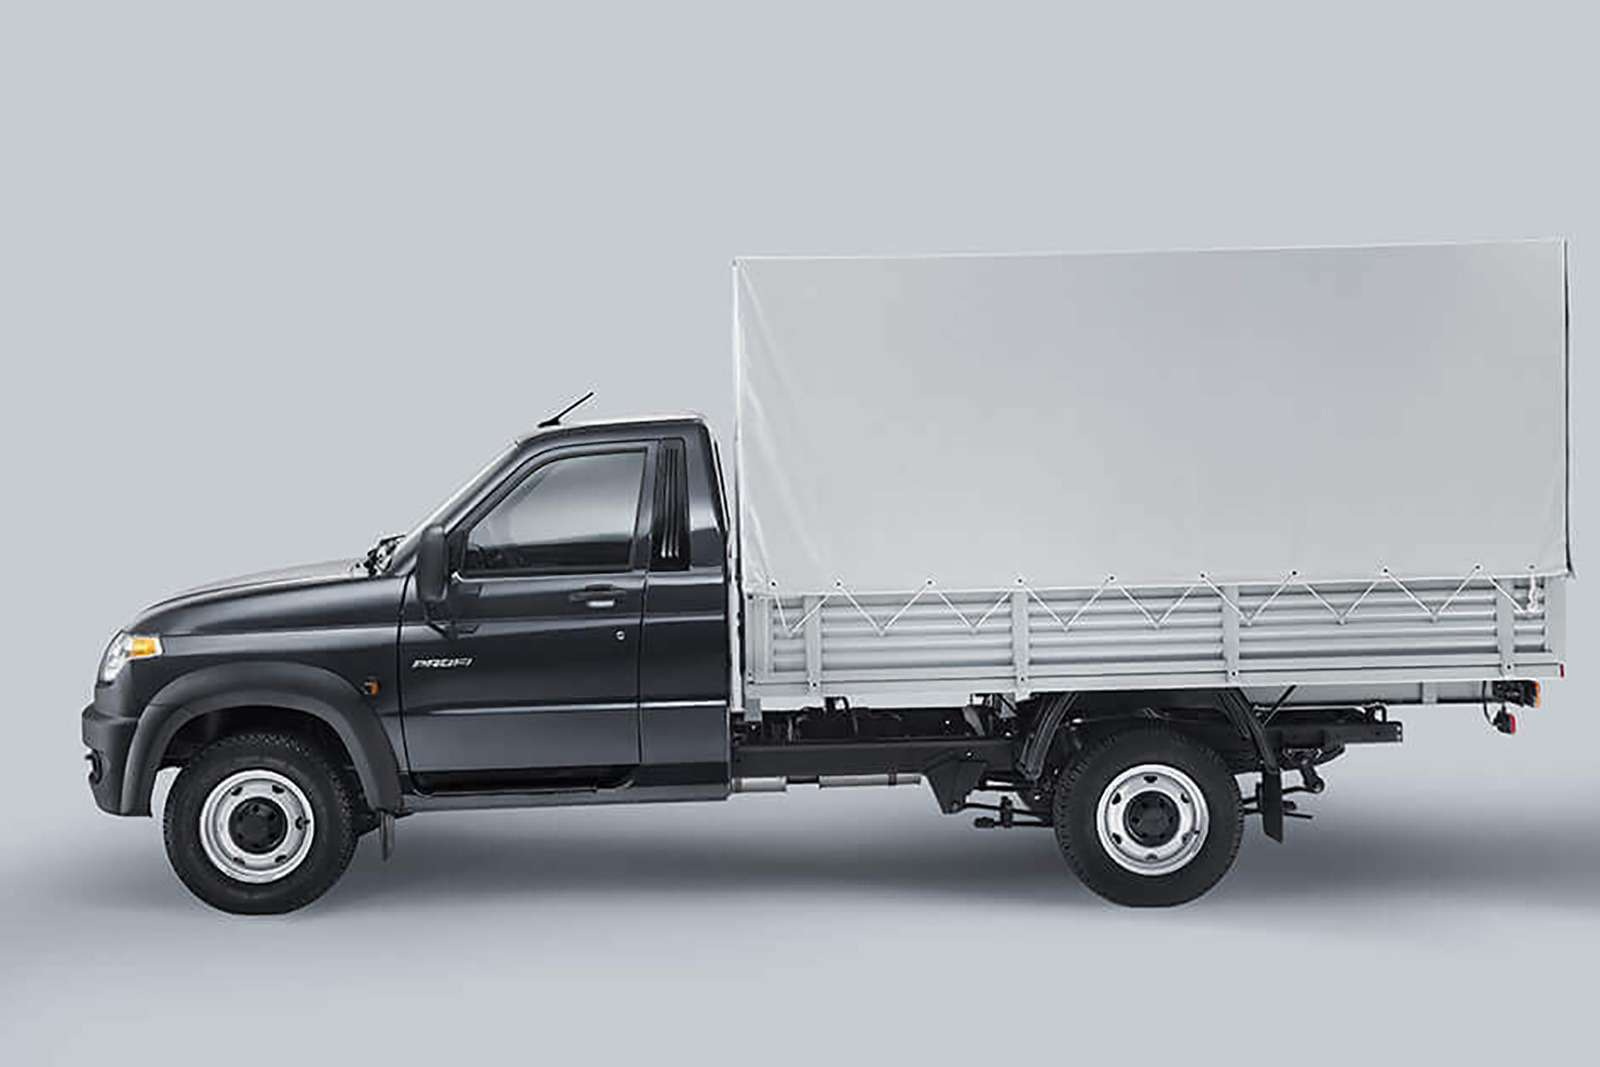 УАЗначал продажи конкурента ГАЗели Бизнес— фото 805861